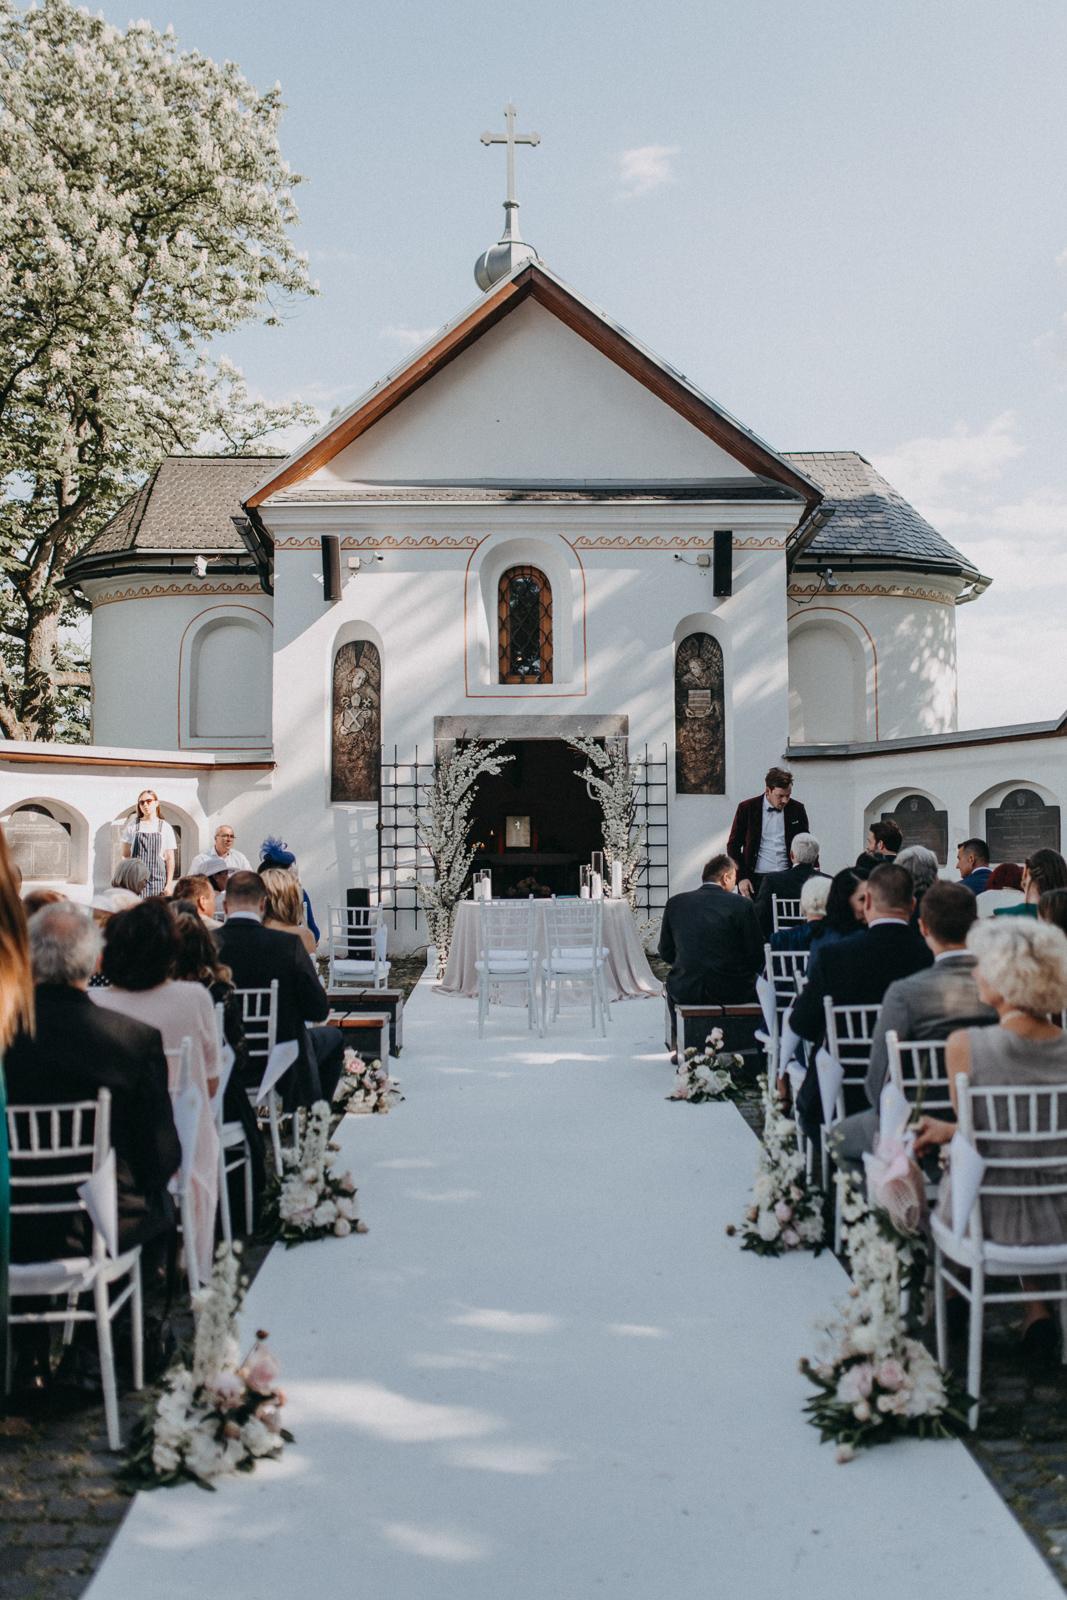 terezaklizanova_weddings - Obrázok č. 5